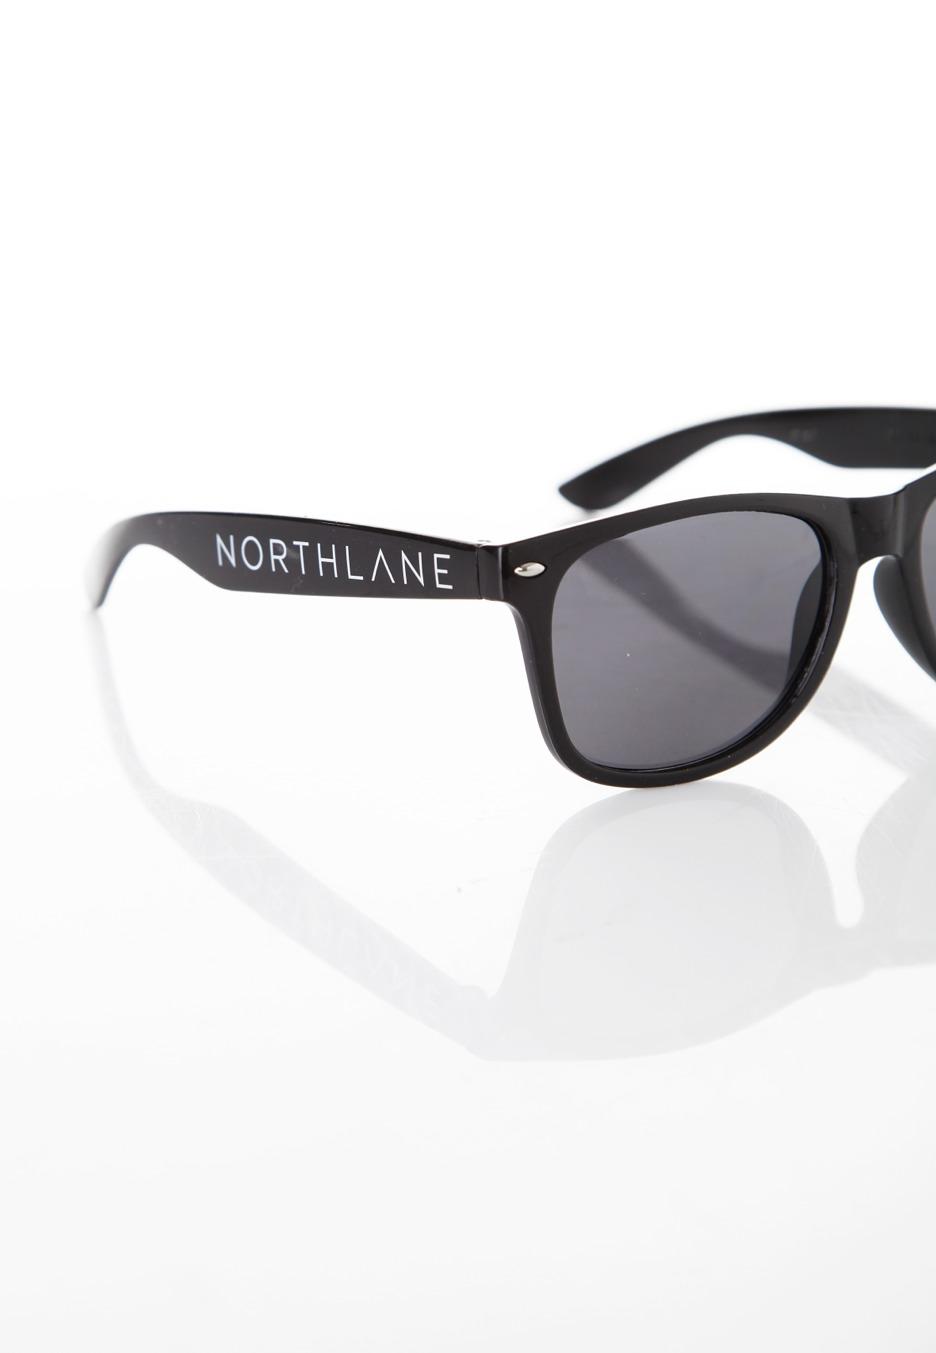 37d2a1f446d Northlane - Logo - Occhiali da sole - Djent Merchandise .